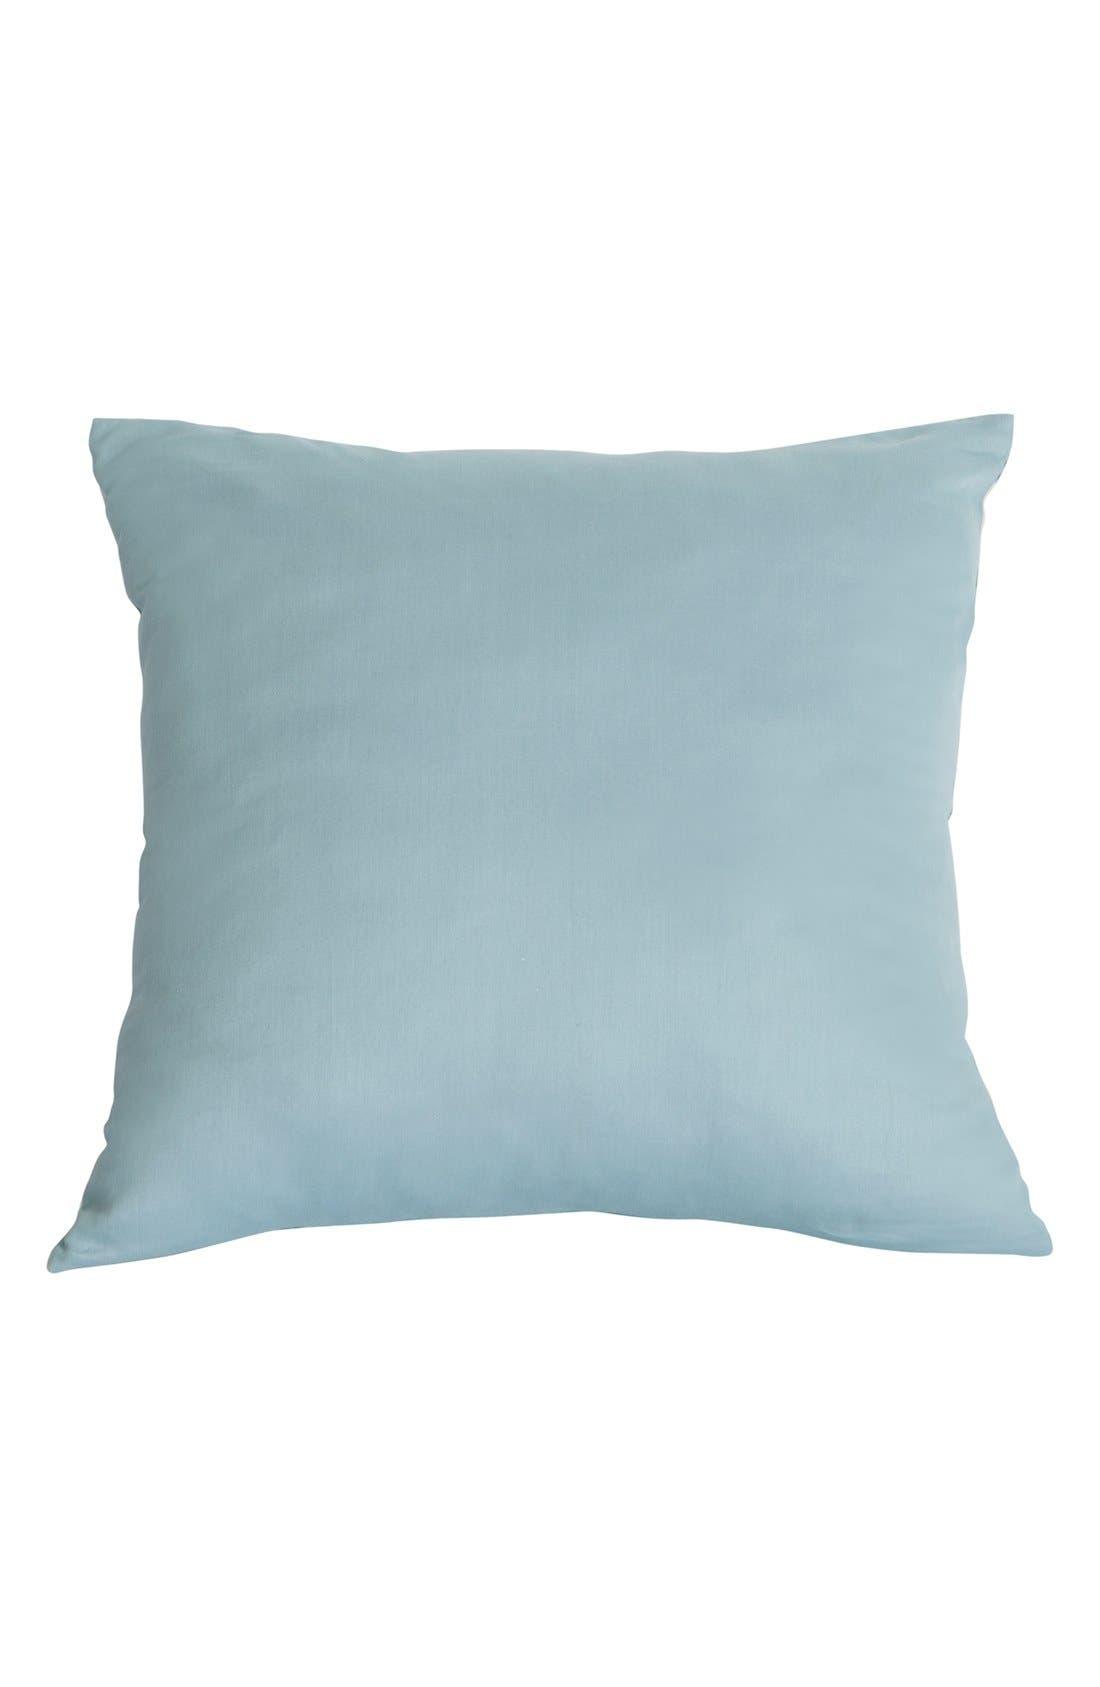 'Kittery' Pillow,                             Alternate thumbnail 2, color,                             STEEL/ GREY